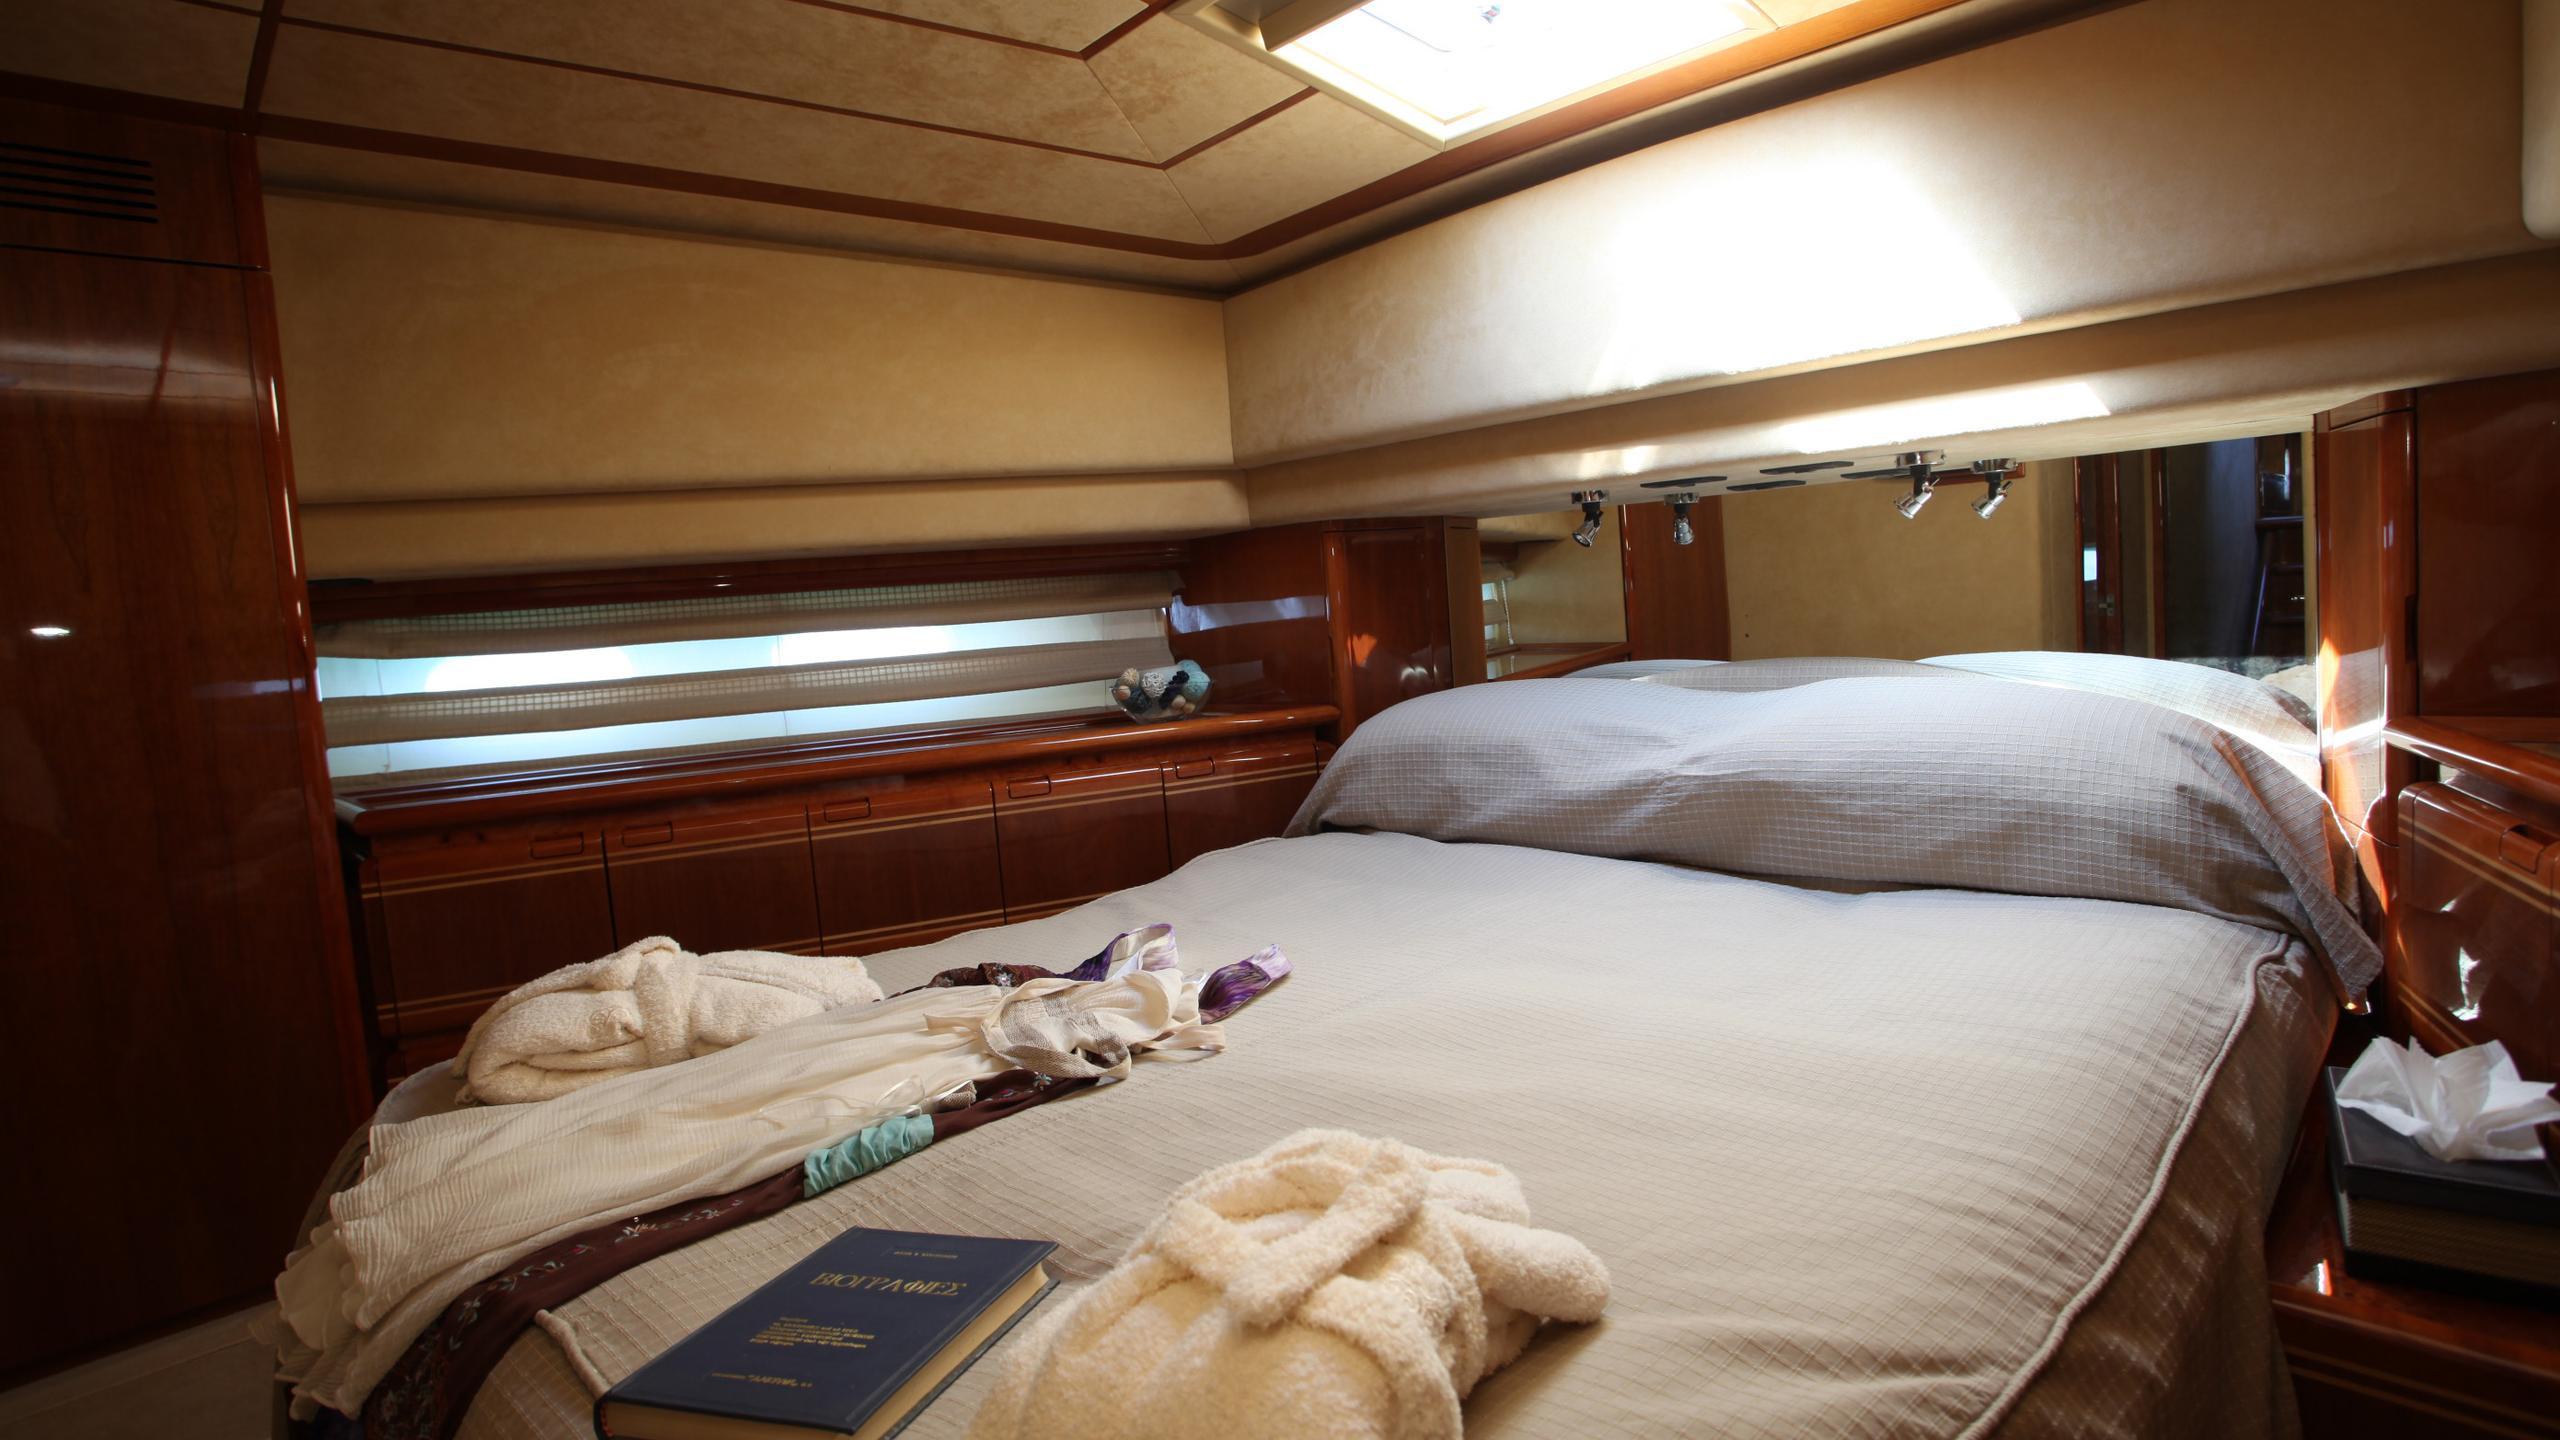 kentavros-ii-yacht-double-cabin